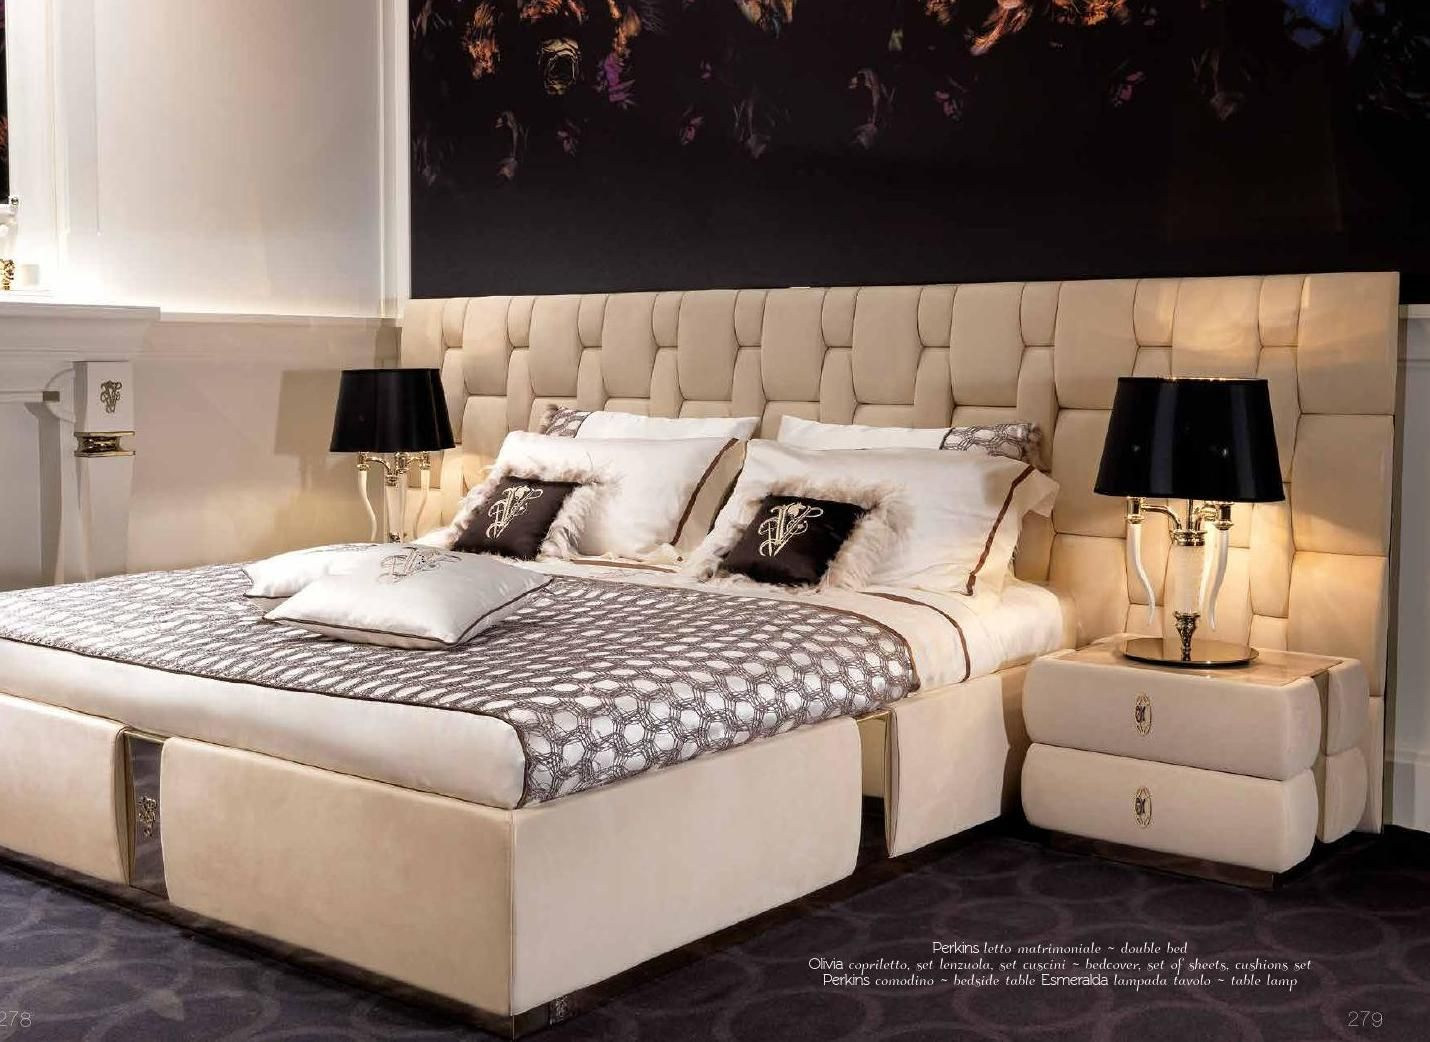 Ipe Cavalli Visionnaire 2014 Bedroom Bed Design Bed Headboard Design Bed Design